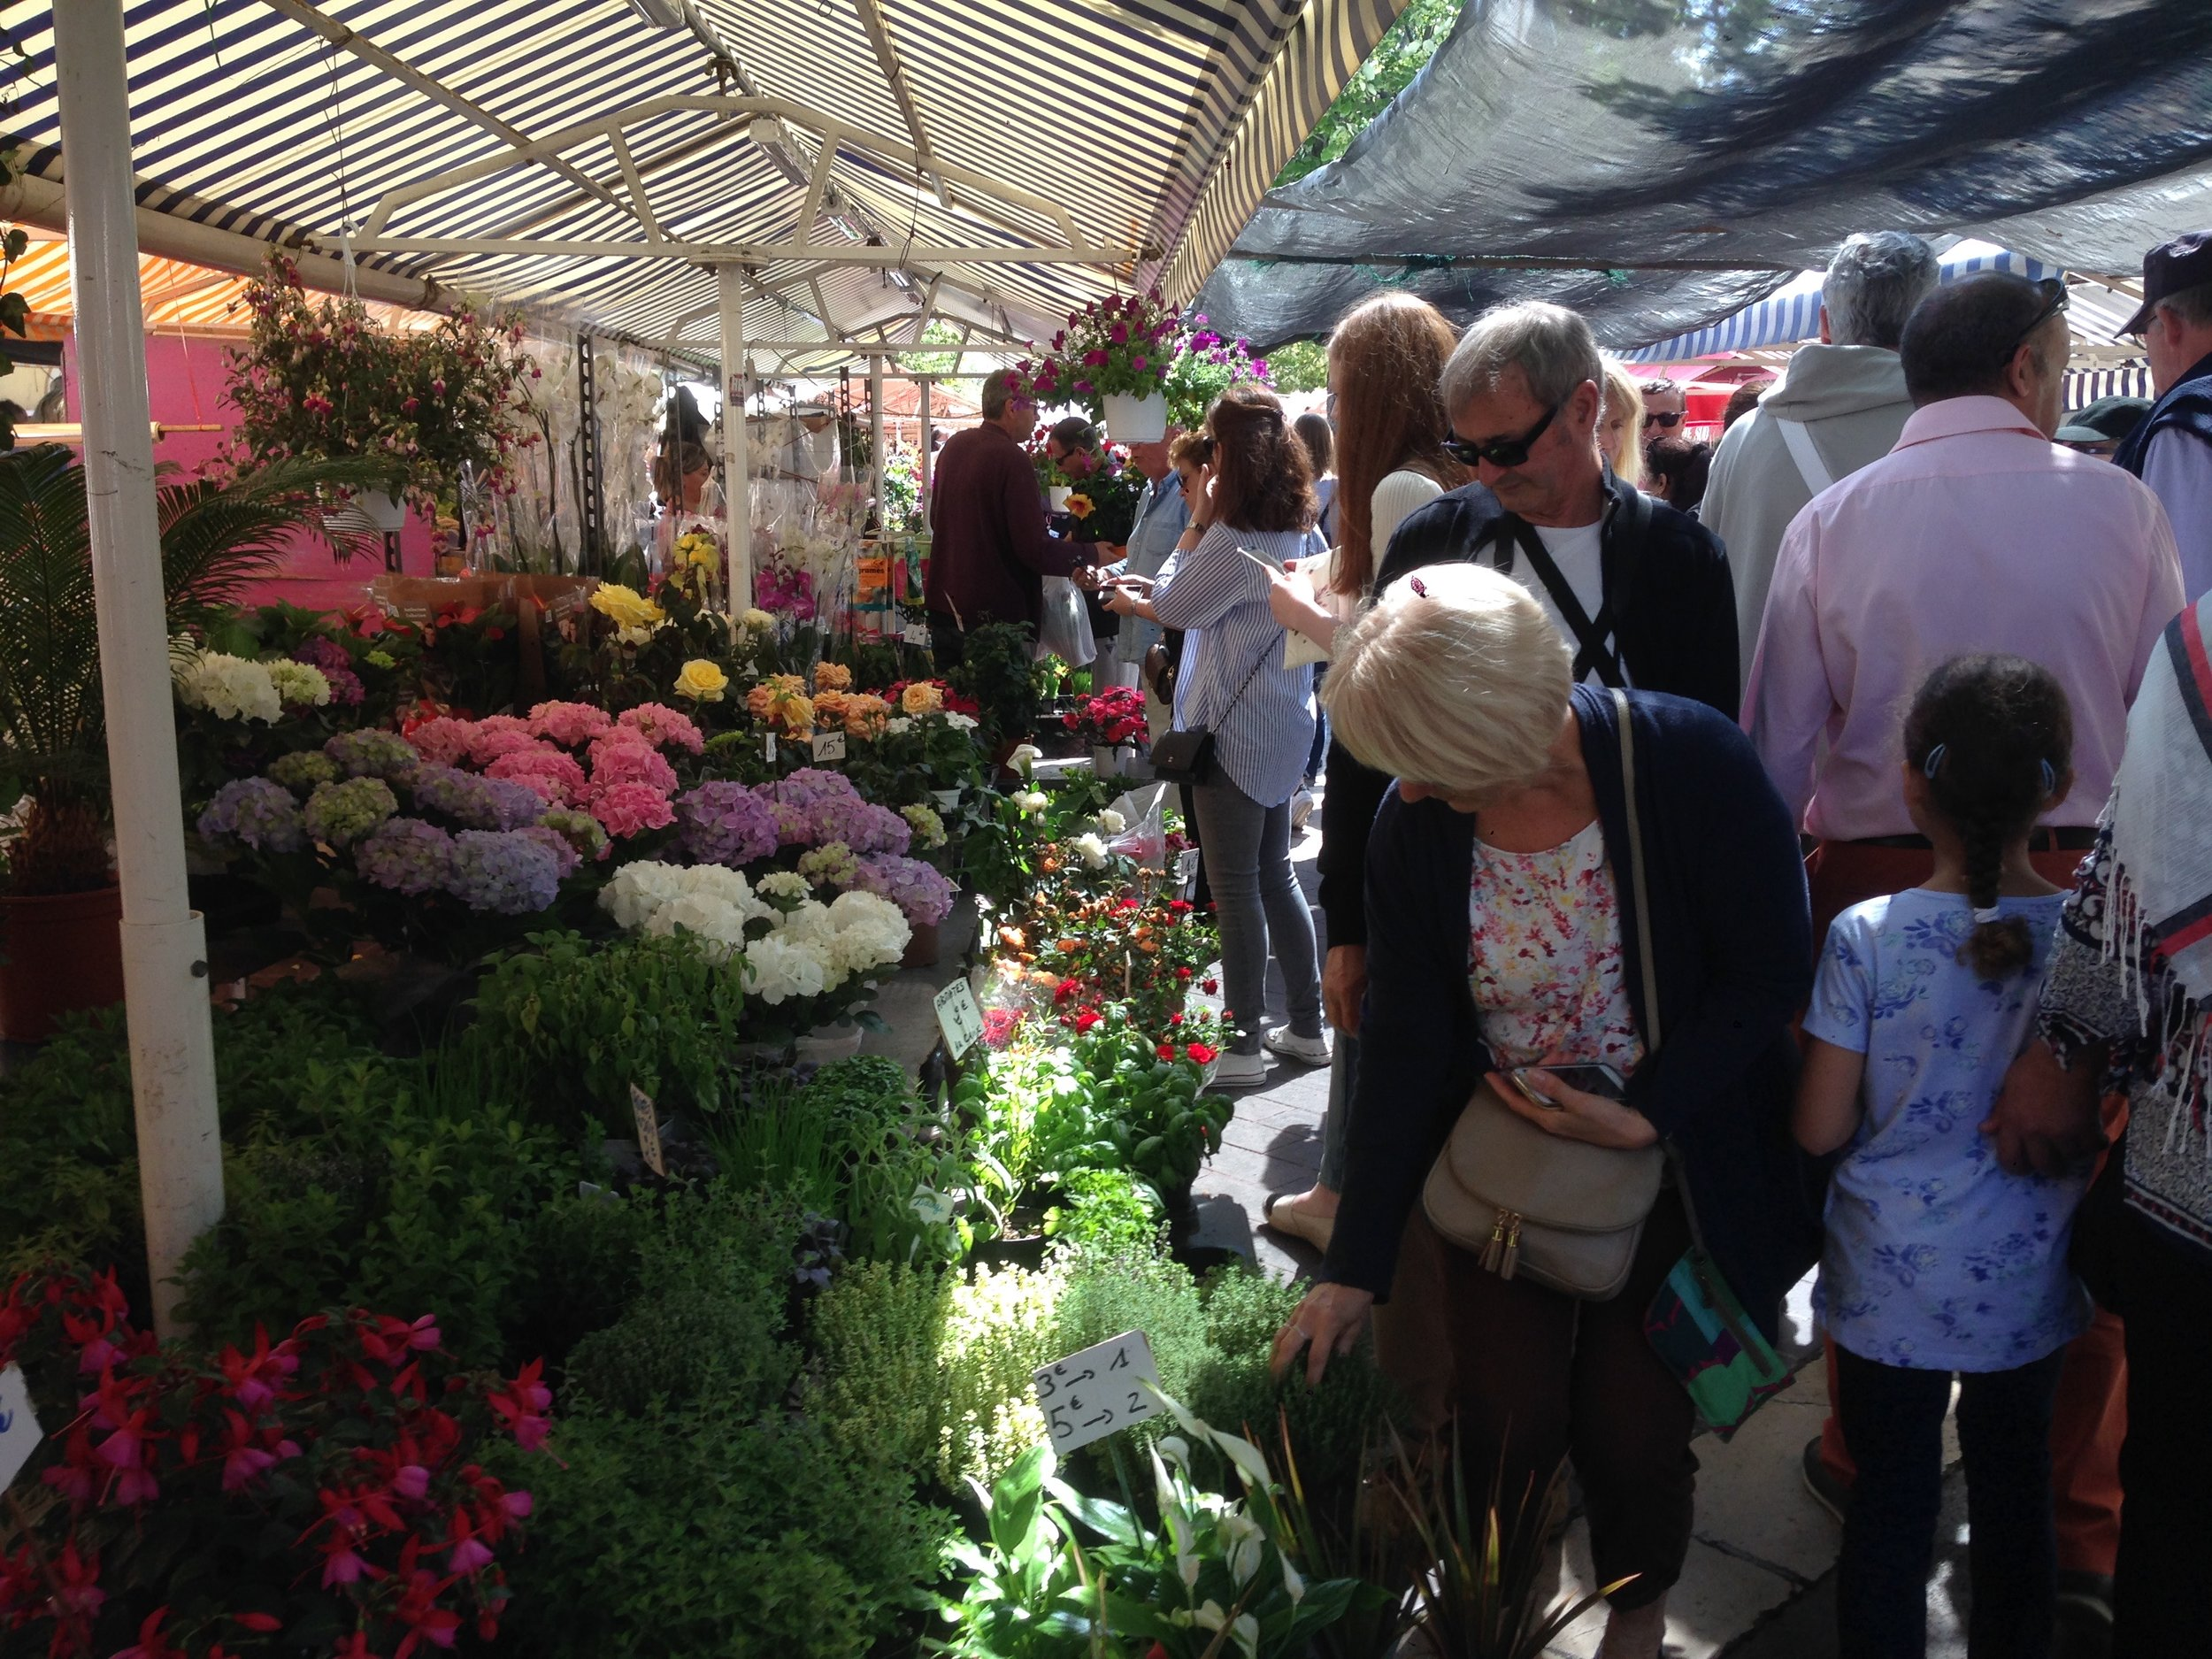 The Nice flower market